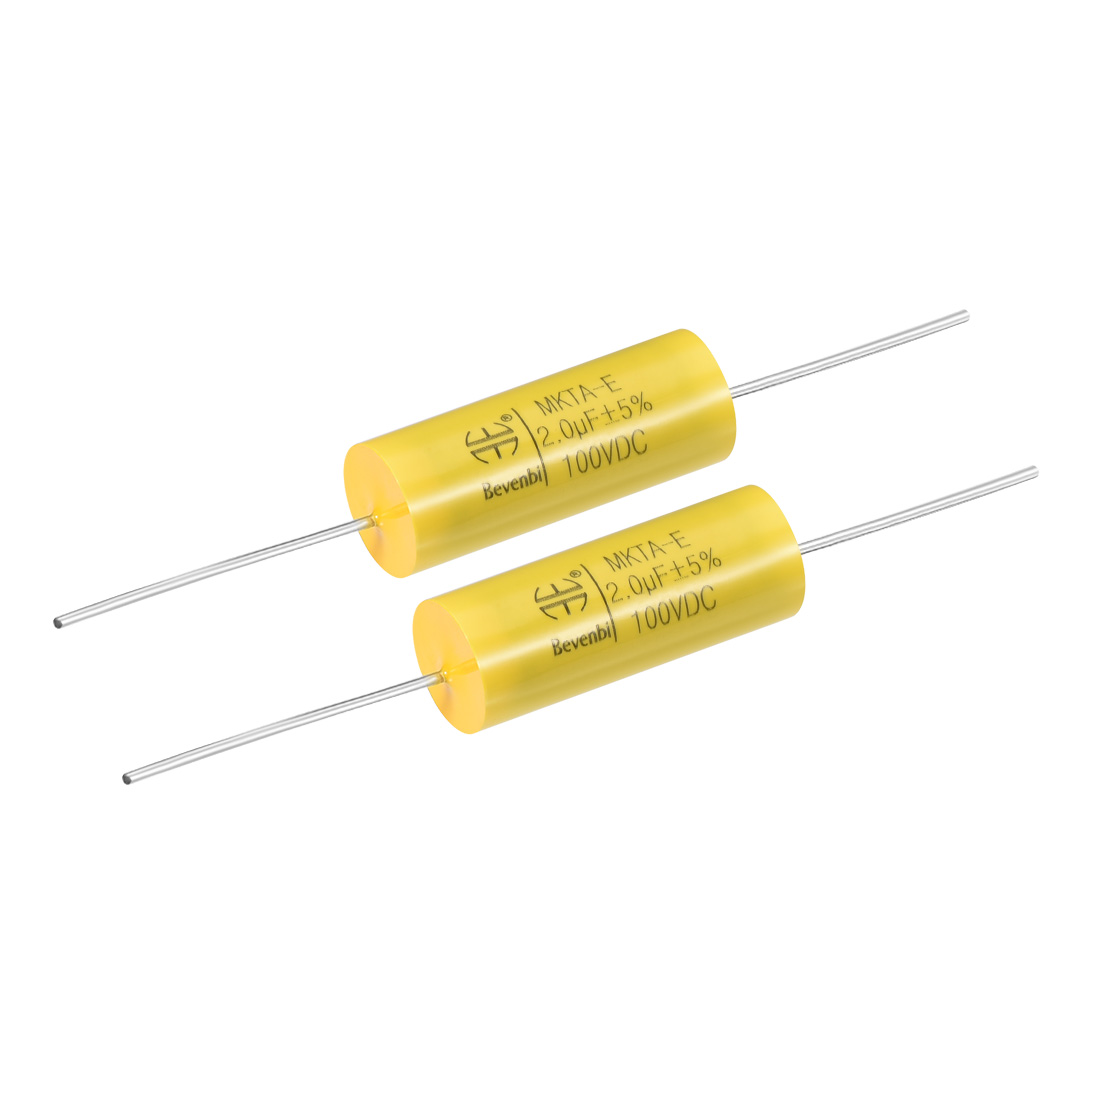 Film Capacitor 100V DC 2.0uF MKTA-E Round Polypropylene Capacitors Yellow 2pcs